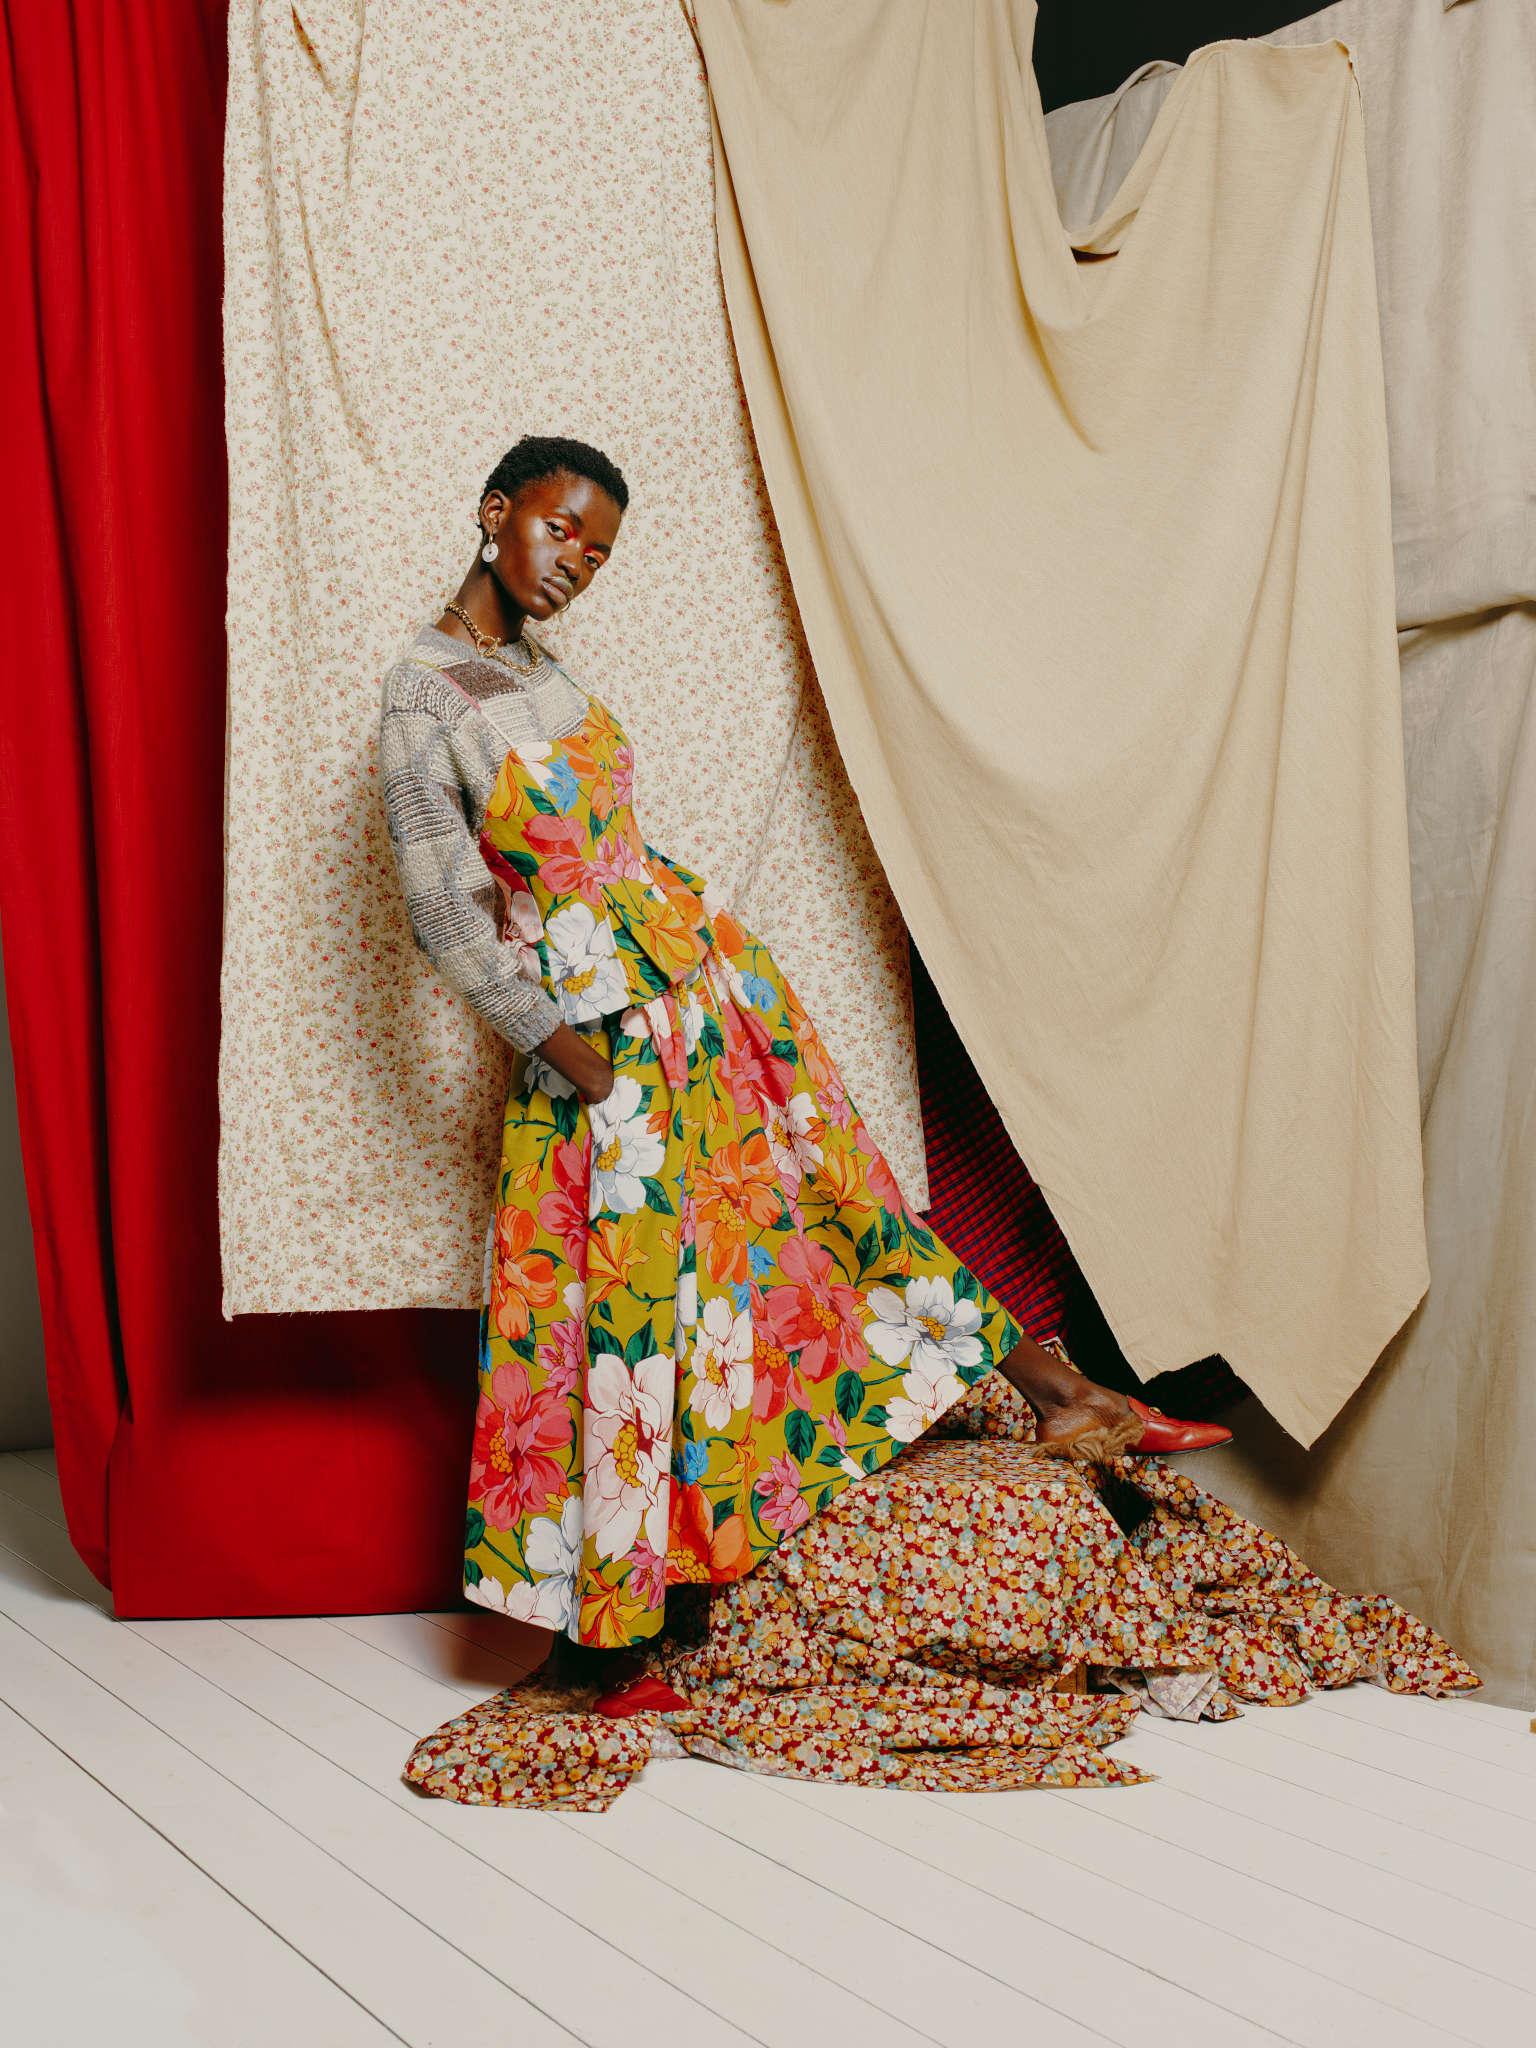 Rock It Vintage jumper, Mara Hoffmann dress, Rejina Pyo earrings, Gucci shoes